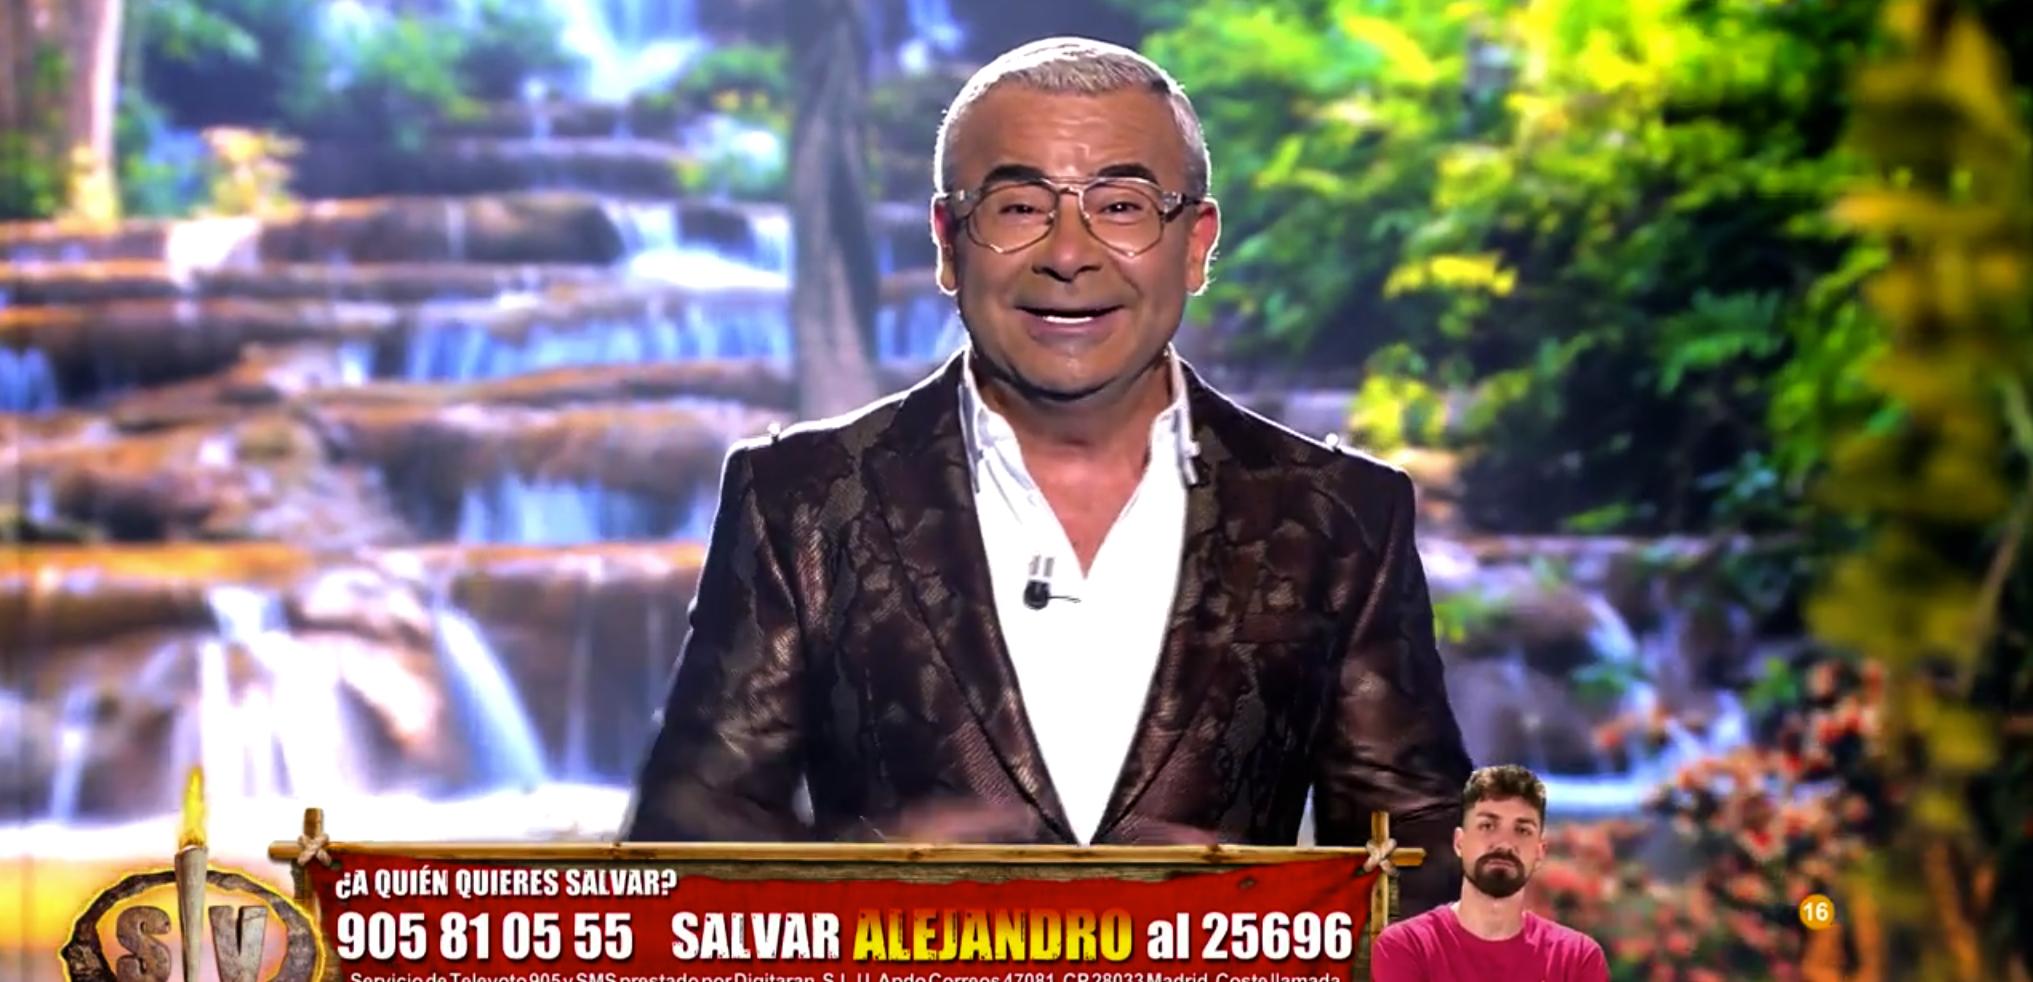 Jorge Javier Vázquez presenta l'última gala de 'Supervivientes' - Telecinco